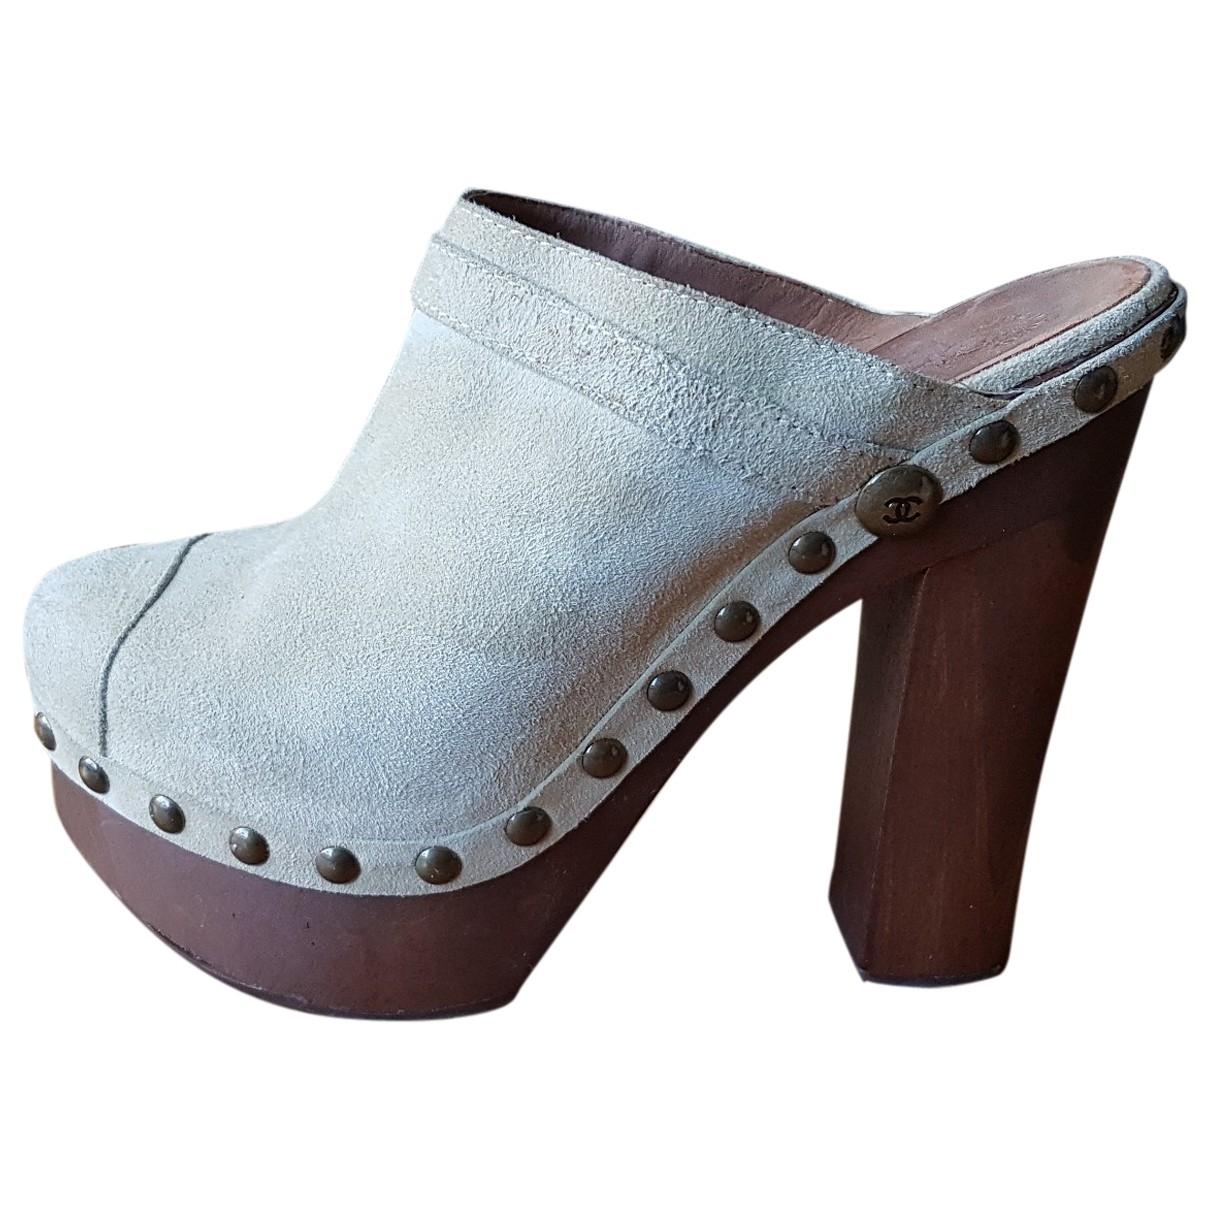 Chanel \N Beige Suede Mules & Clogs for Women 39 EU